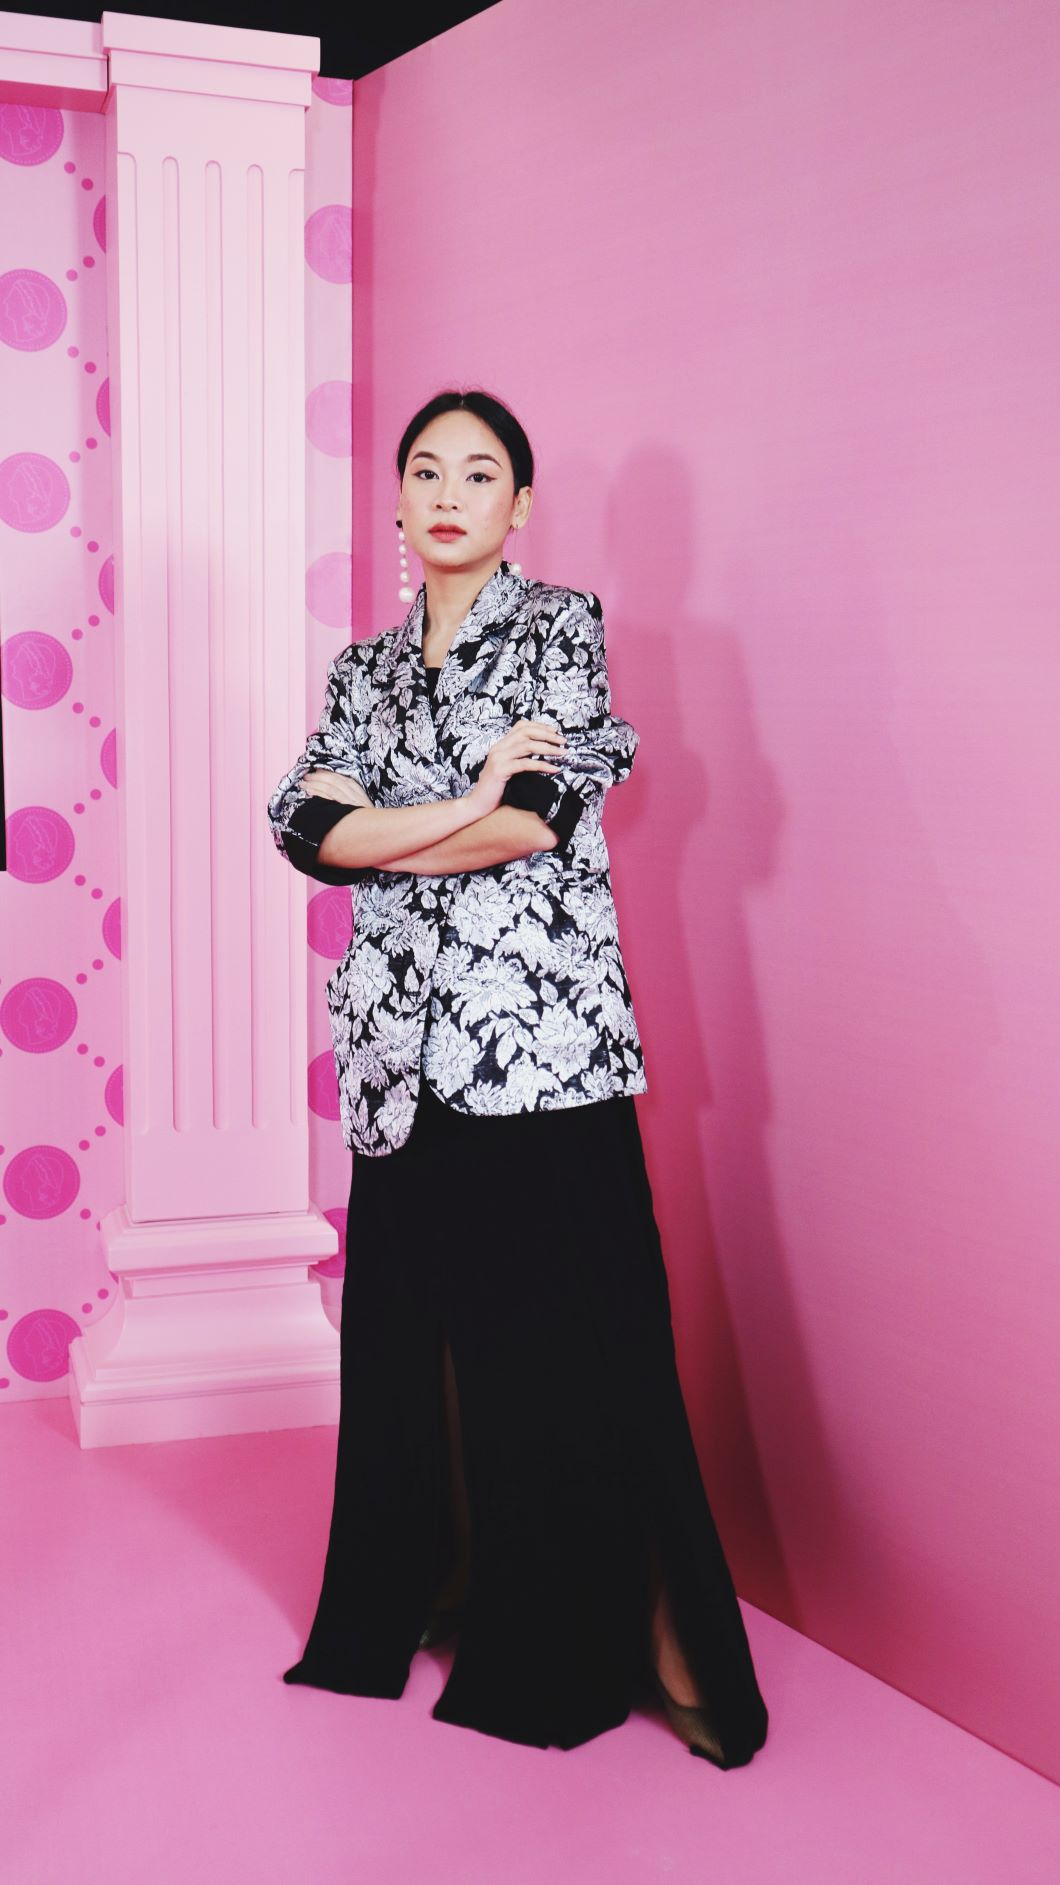 BeautyFest Asia 2020 Virtual Red Carpet